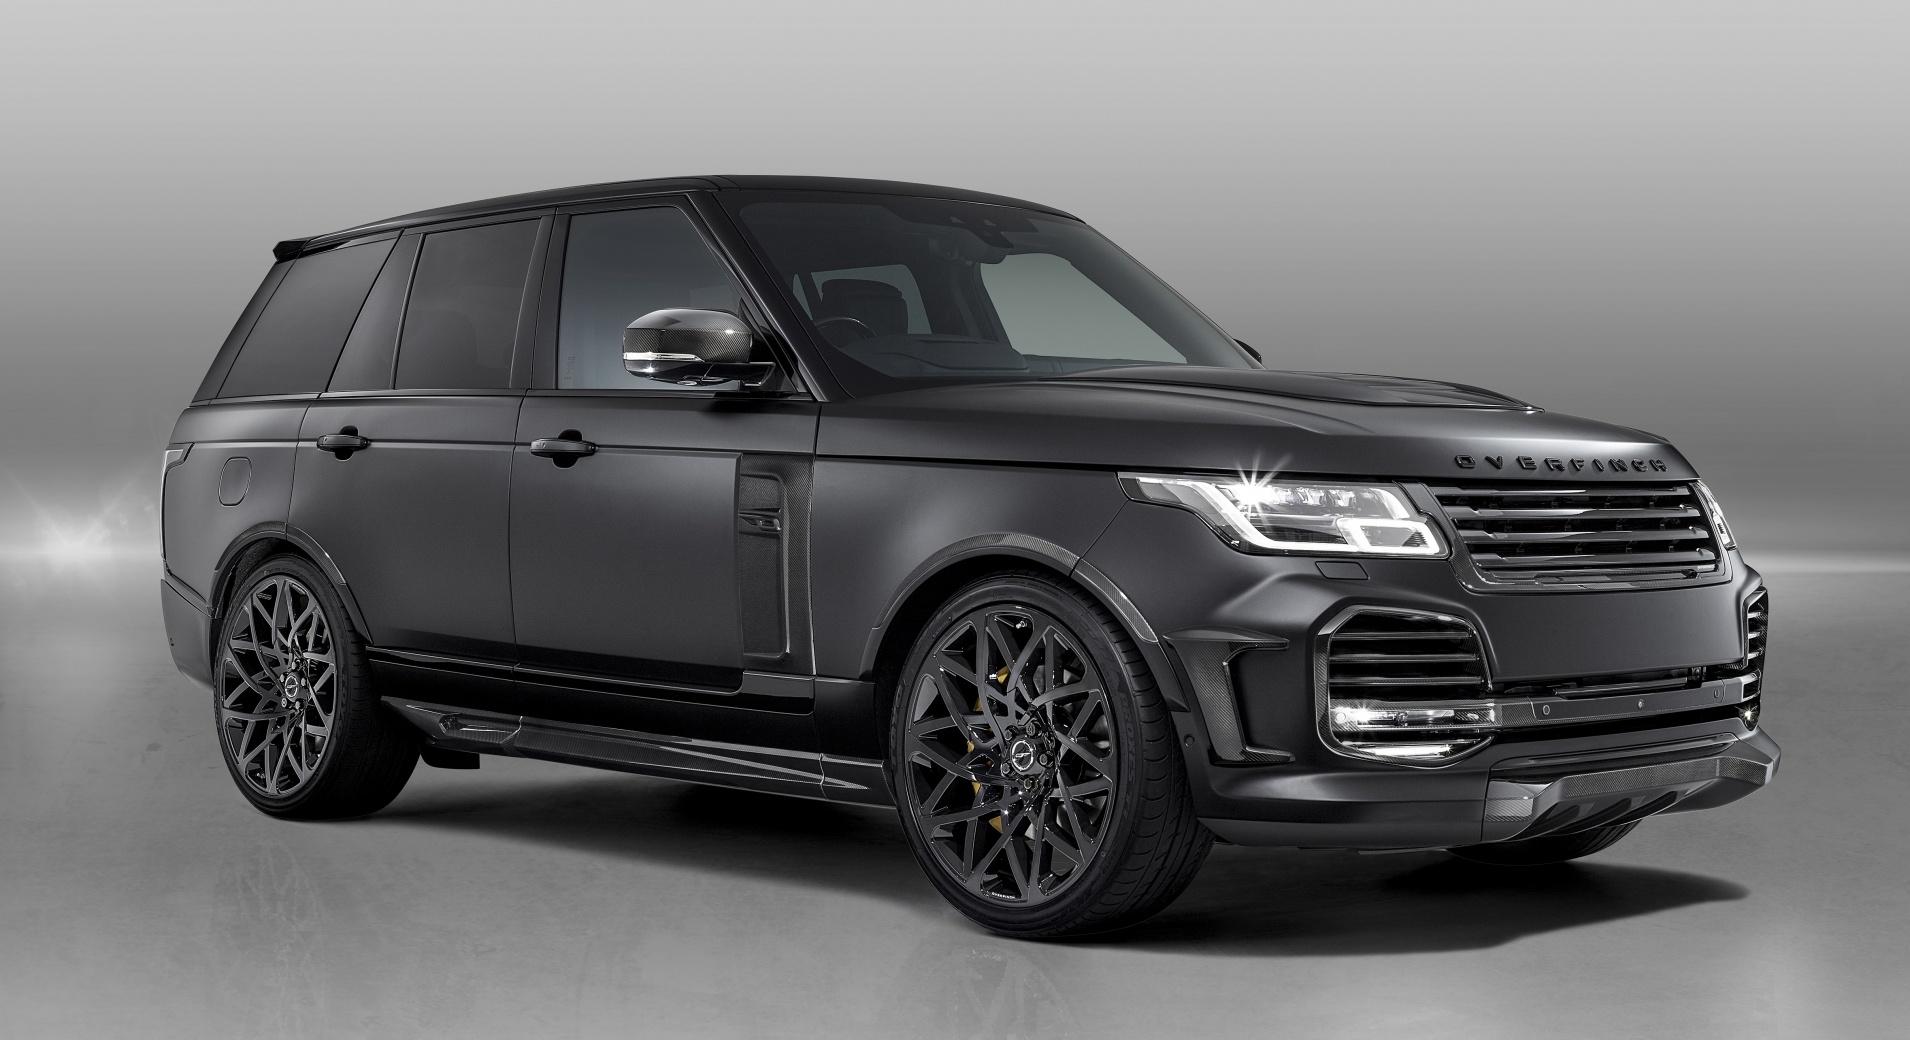 Британское тюнинг-ателье Overfinch представило проект Overfinch Velocity, построенный на базе Range Rover.